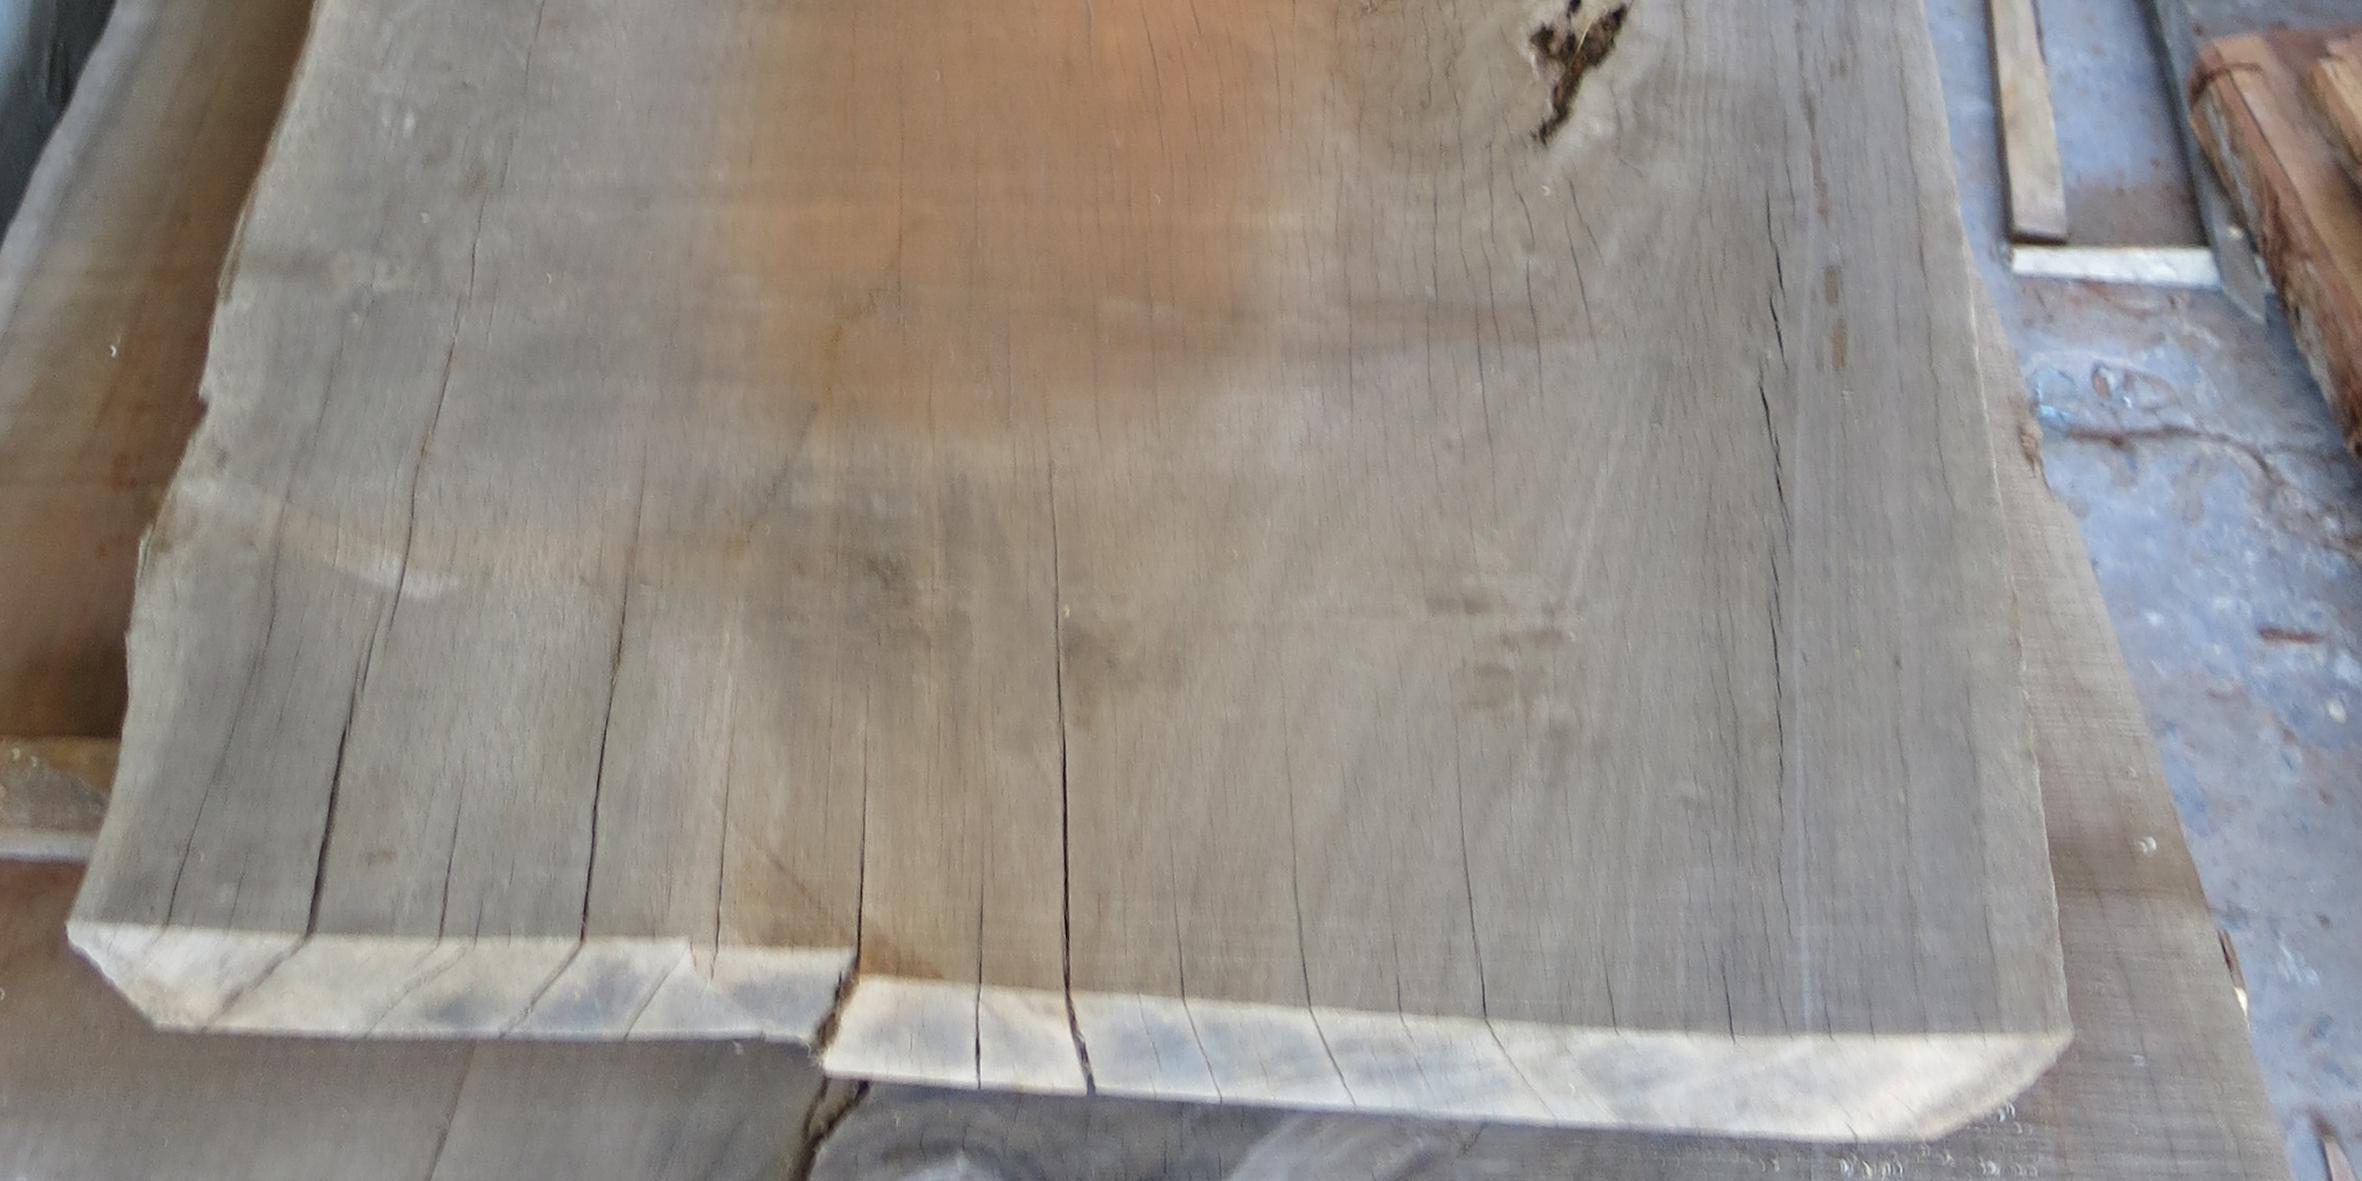 rose gum slab, approximate dimensions 2700 l  x 960 w x 80d_2